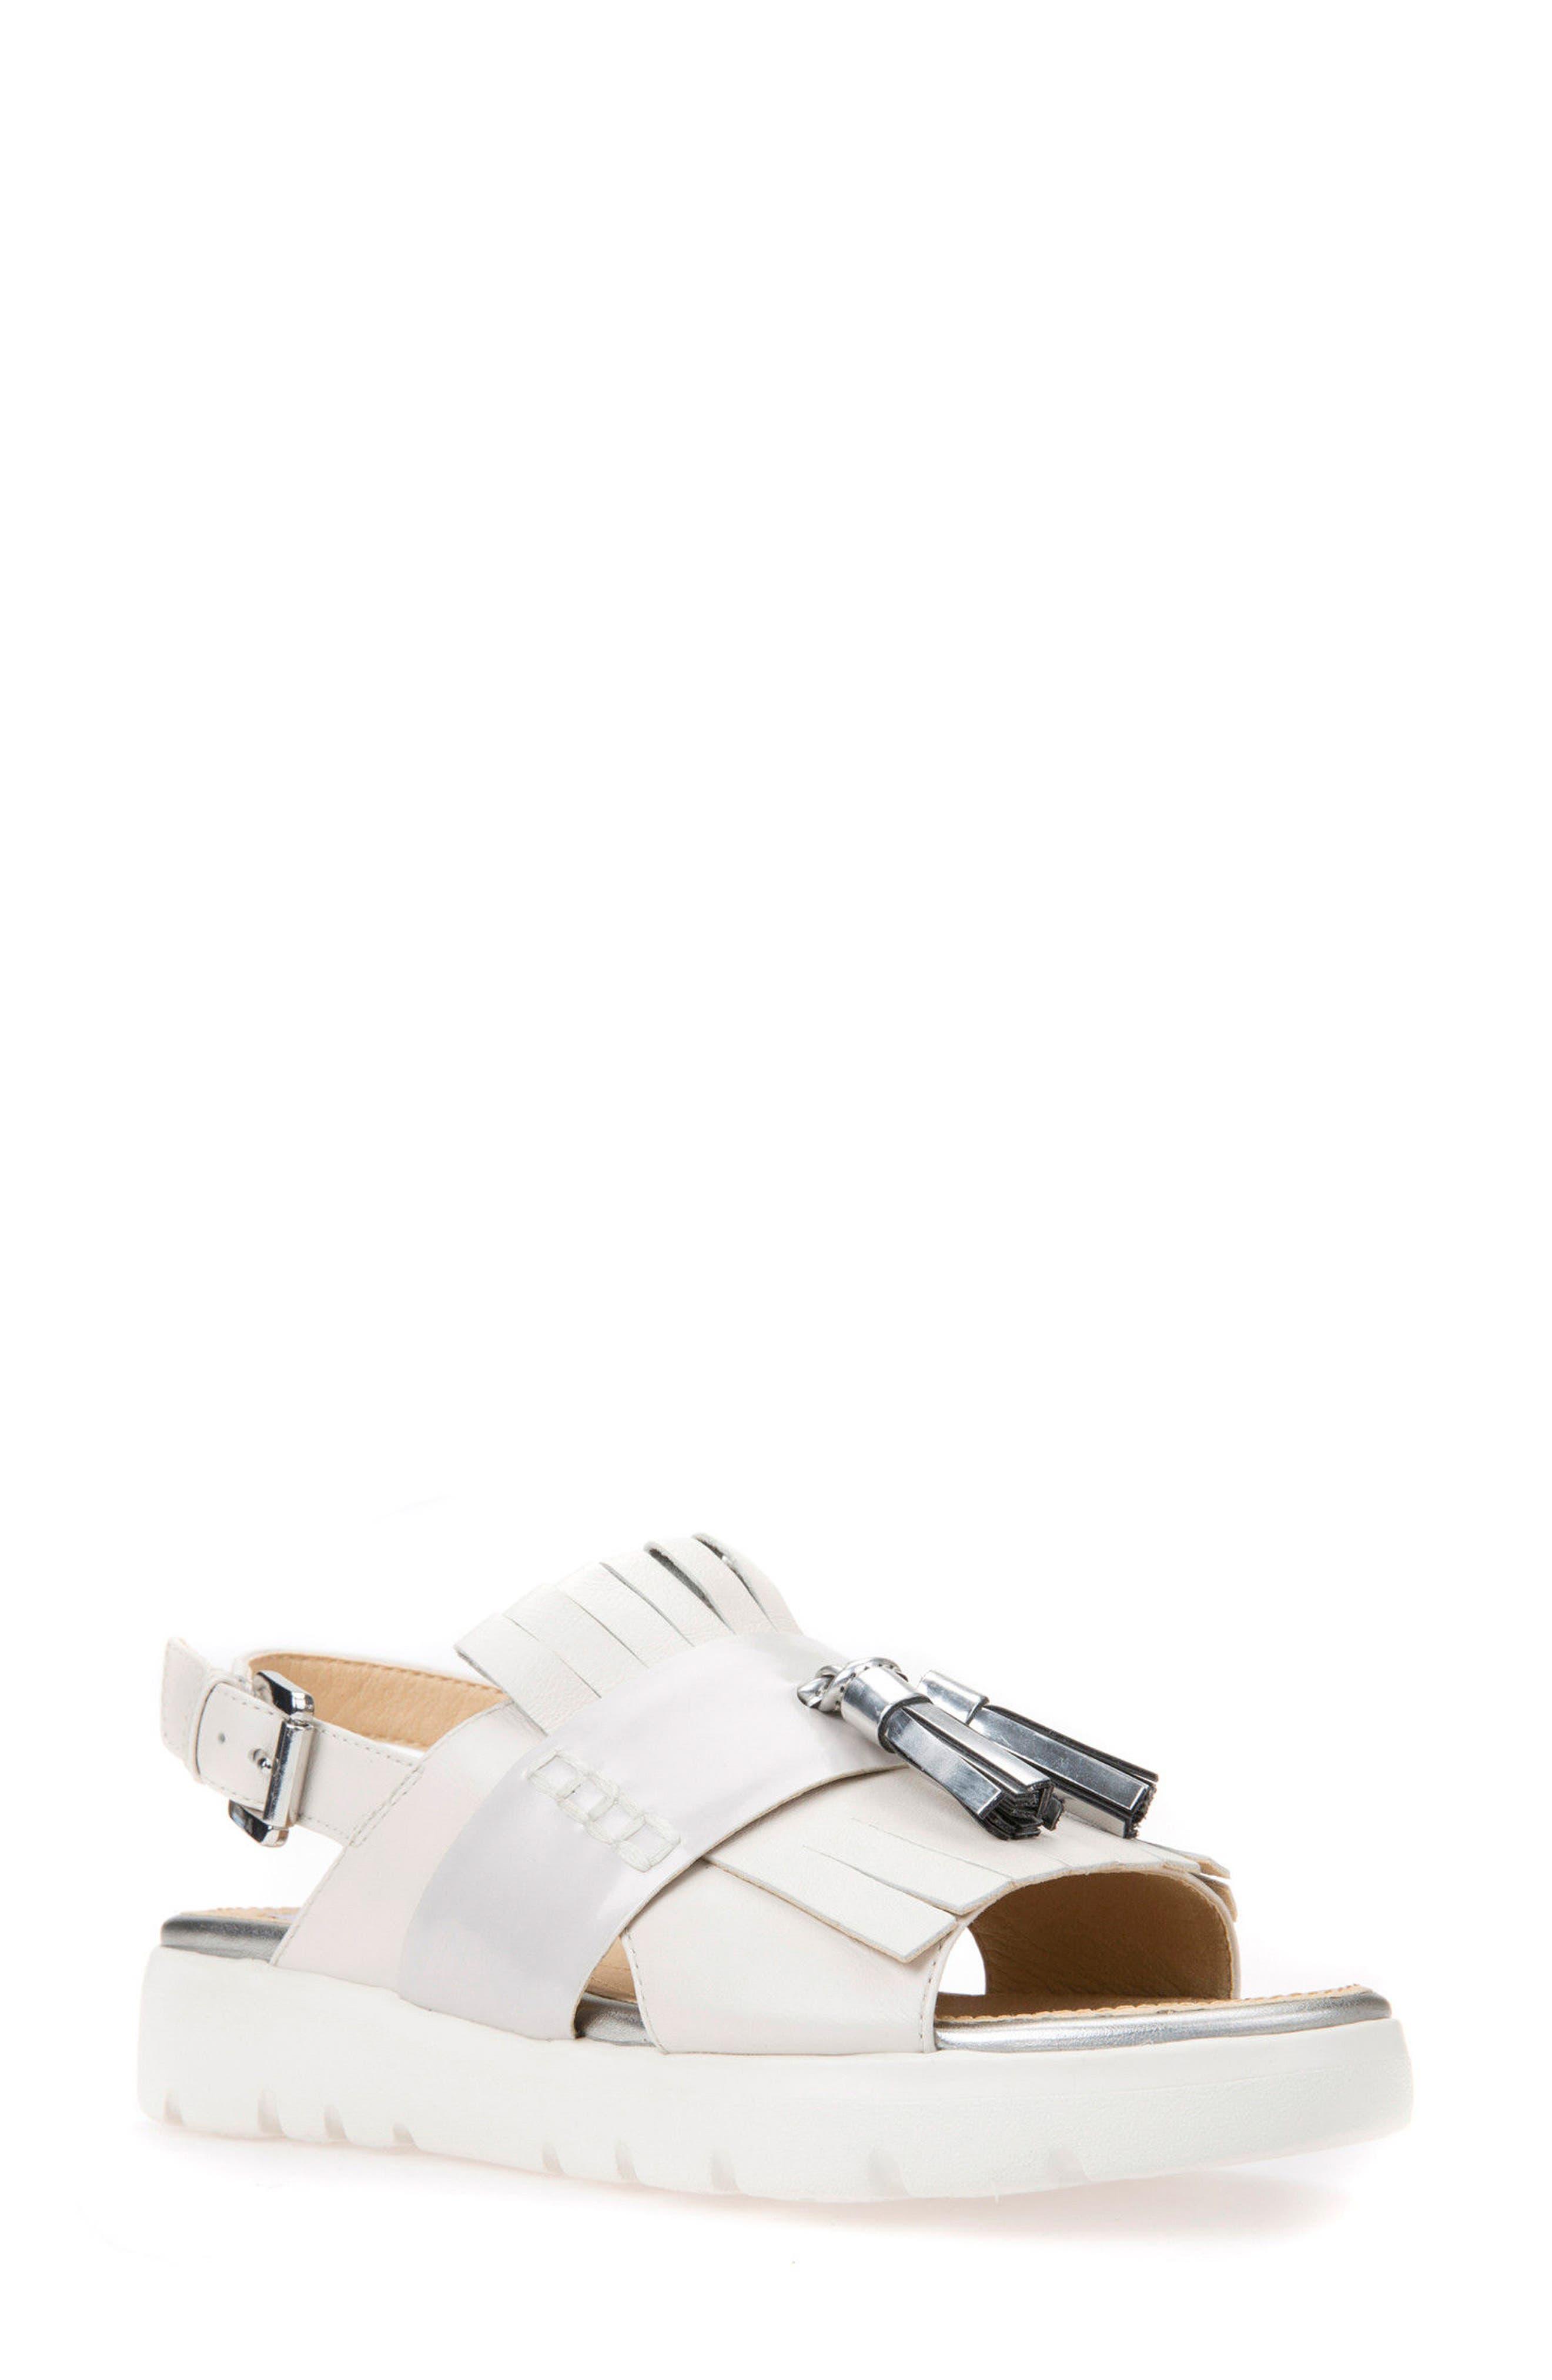 Amalitha Platform Sandal,                         Main,                         color, OFF WHITE LEATHER